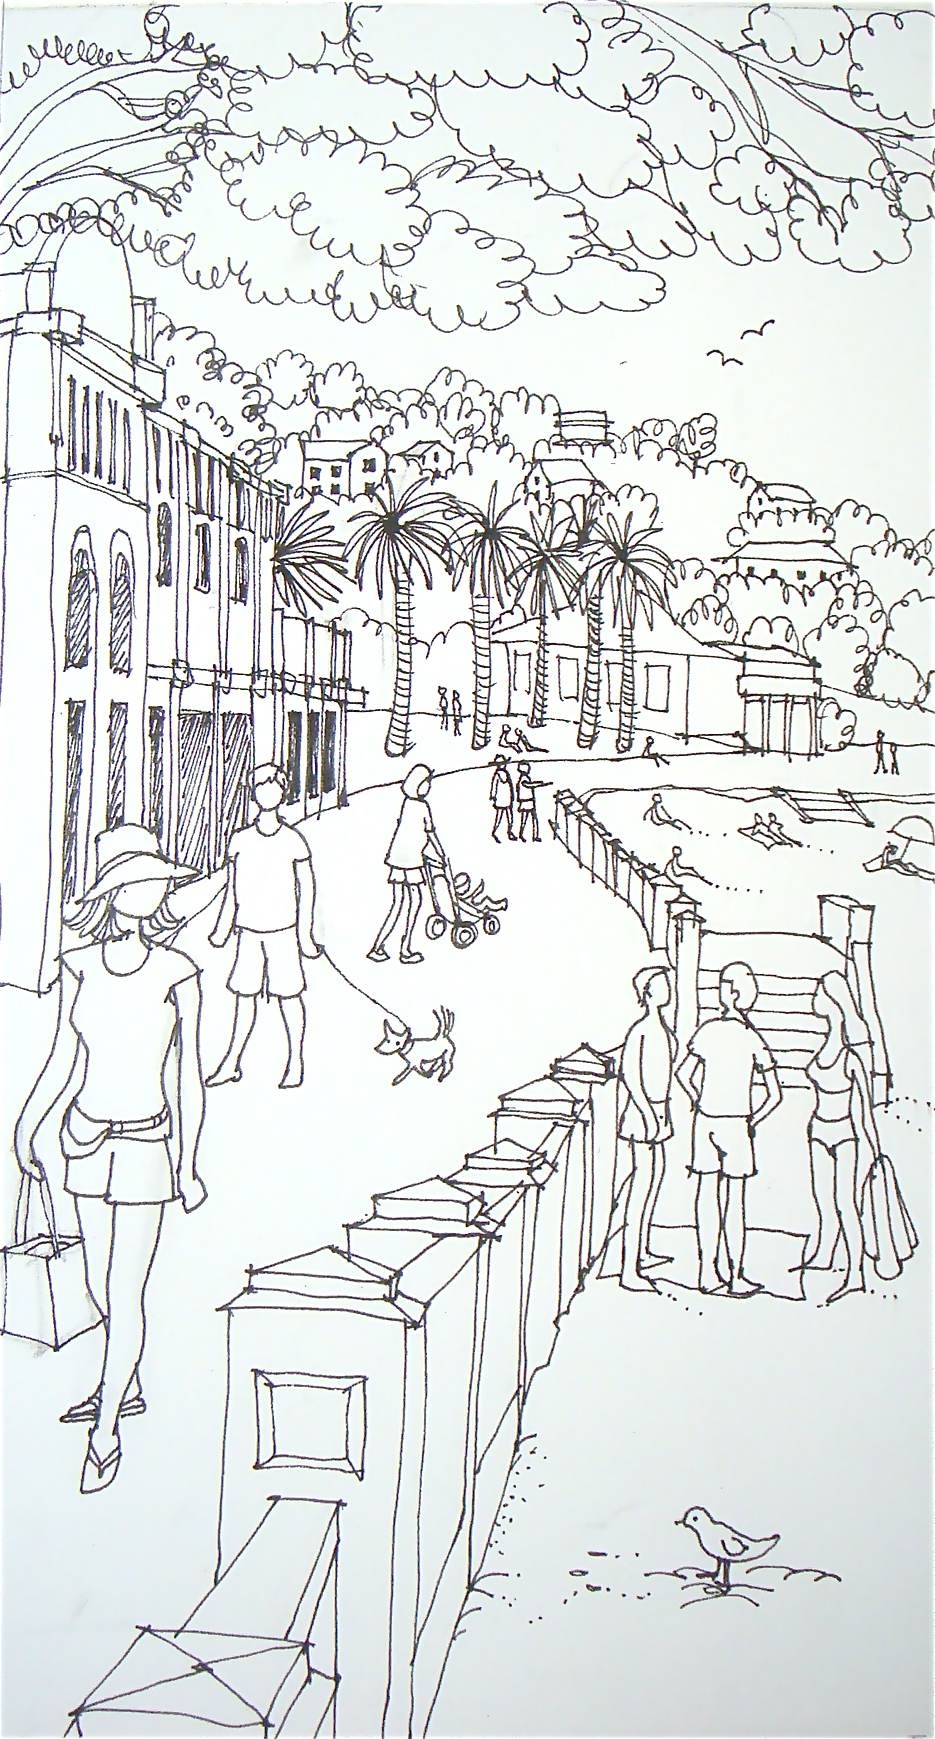 The Line Art : Line watercolour on the esplanade